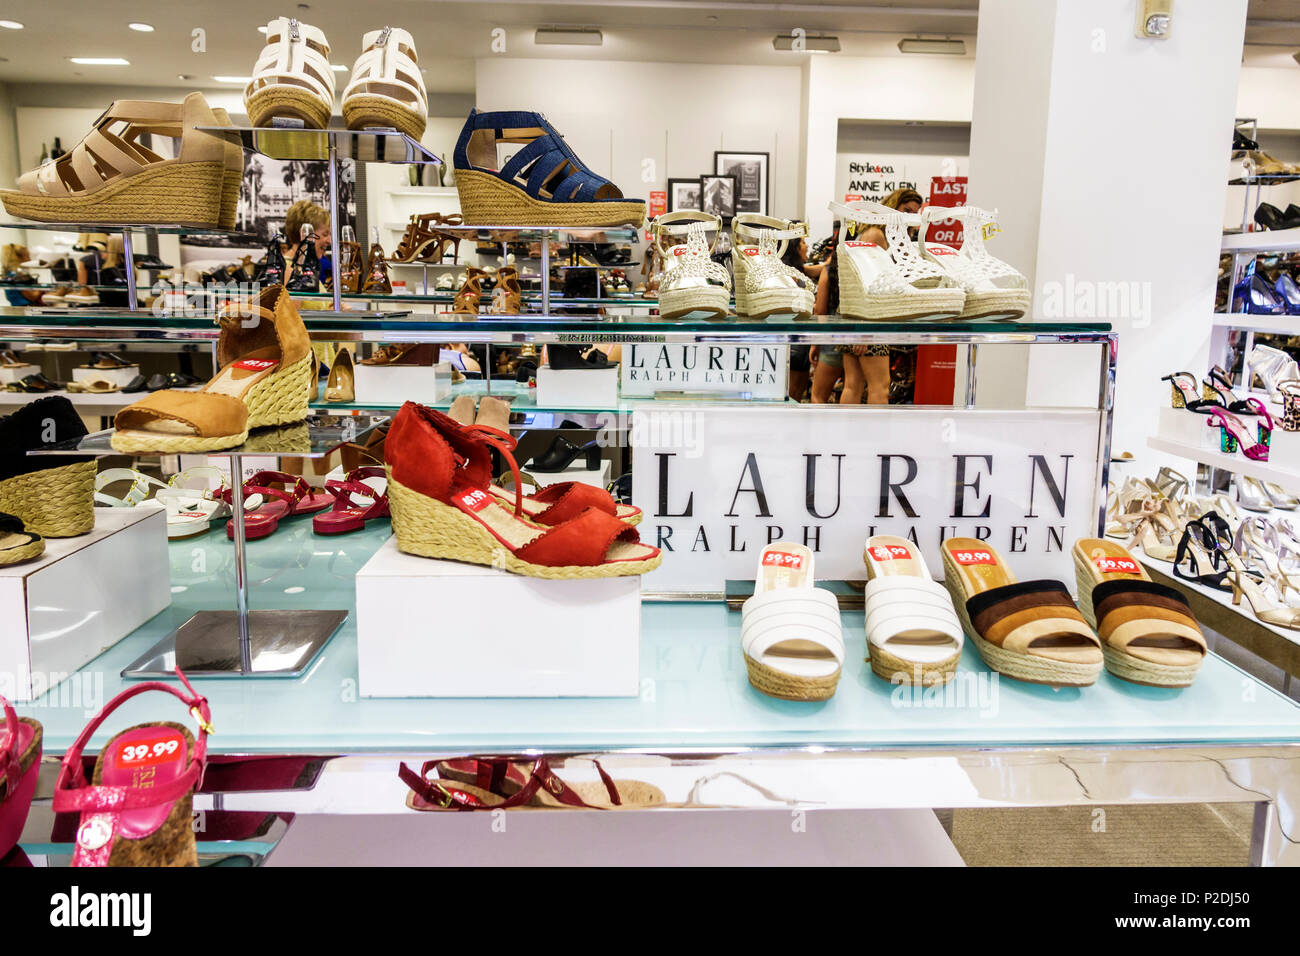 Florida Jensen Beach Macy's Department Store inside shopping women's shoes Ralph Lauren designer brand sandals wedges sale display - Stock Image